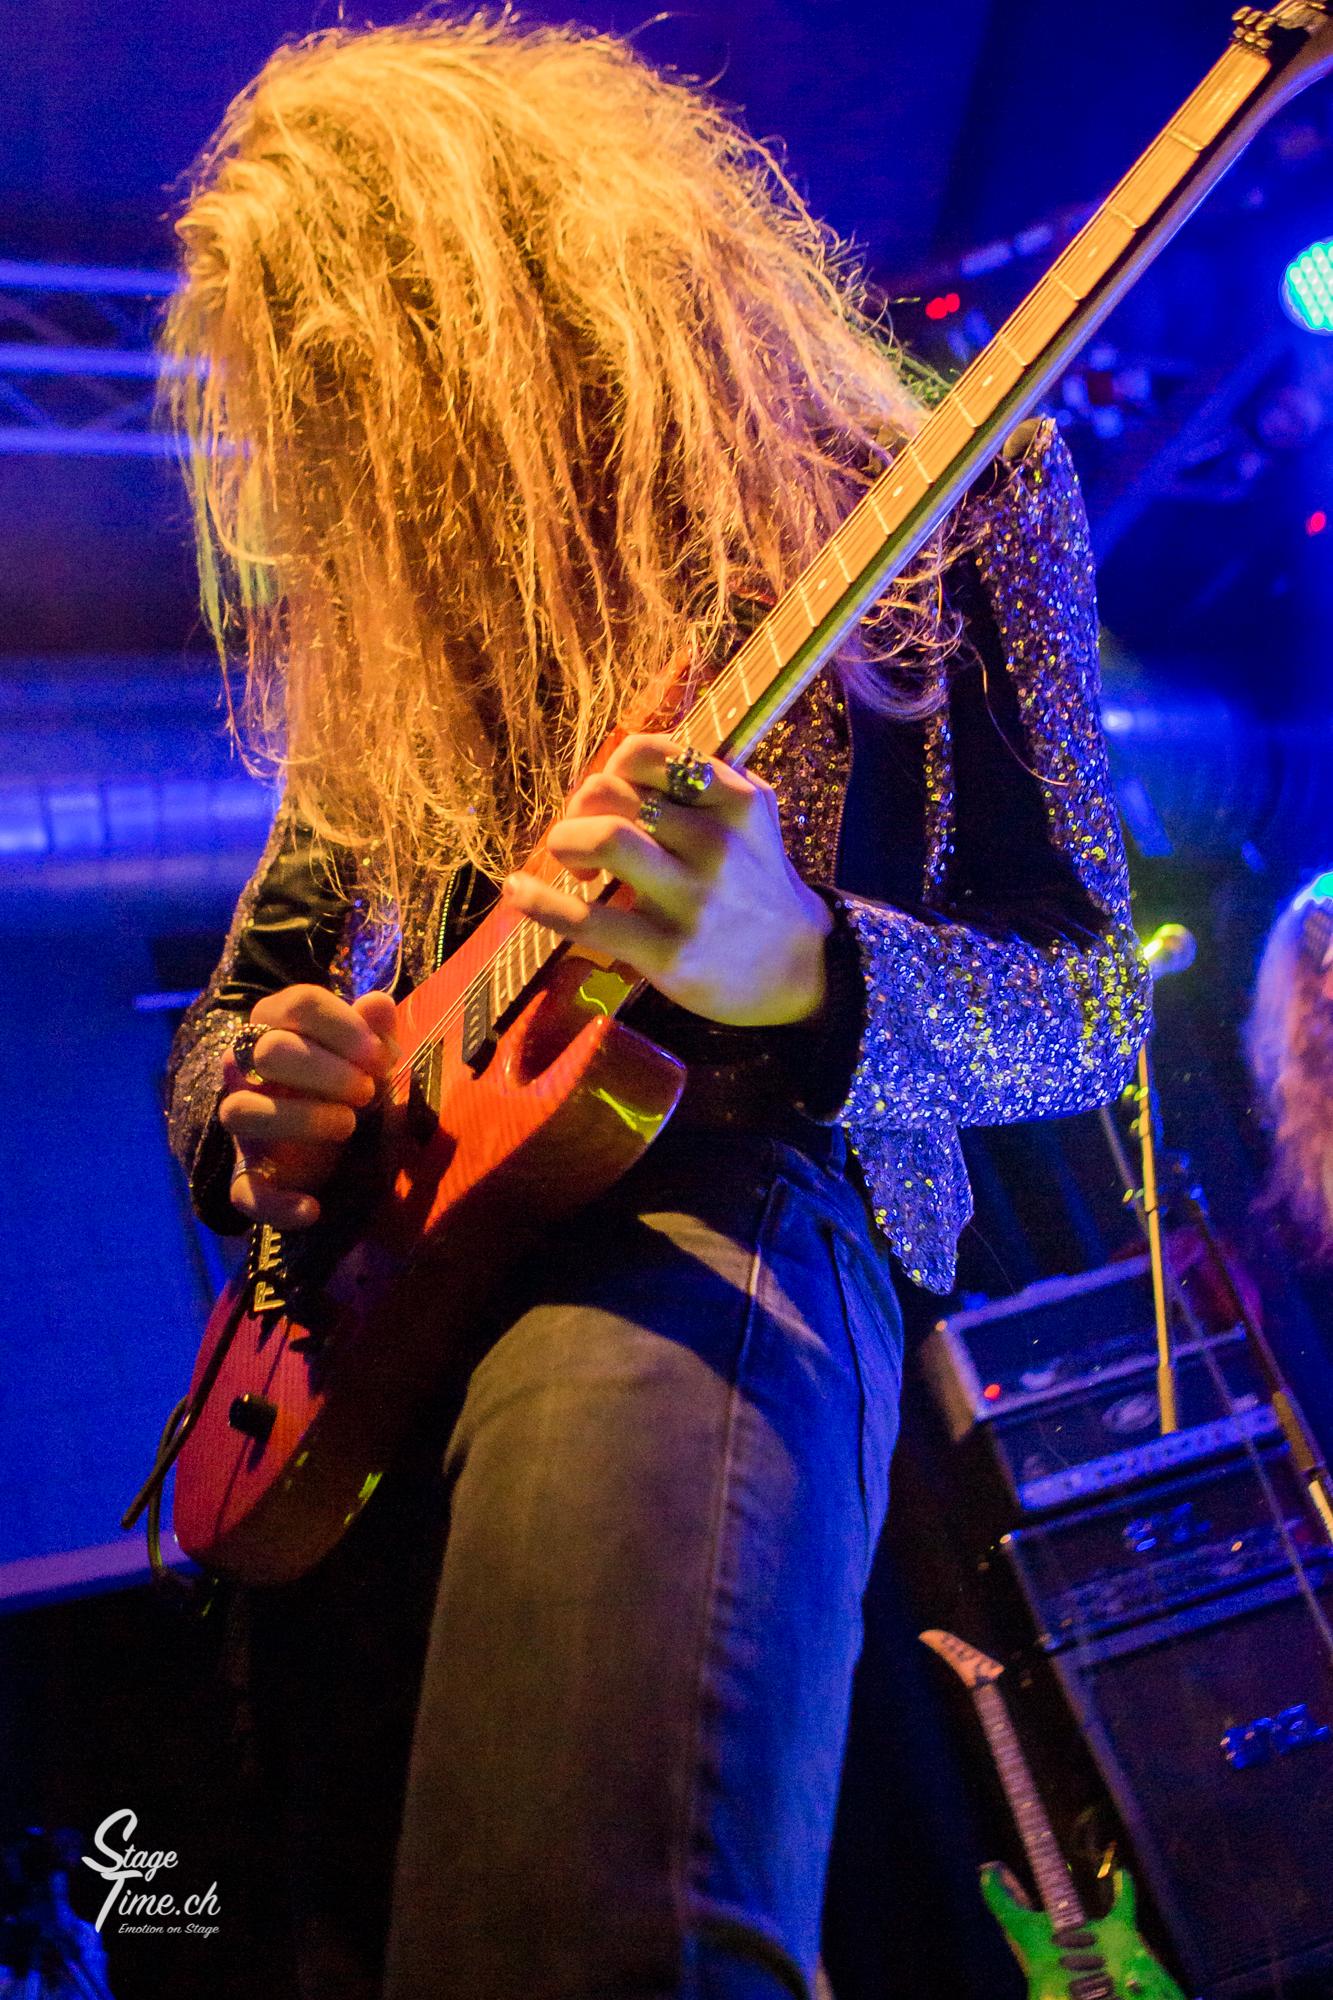 Rusted_Guns___1st_Swiss_Glam_Rock_Fest-2